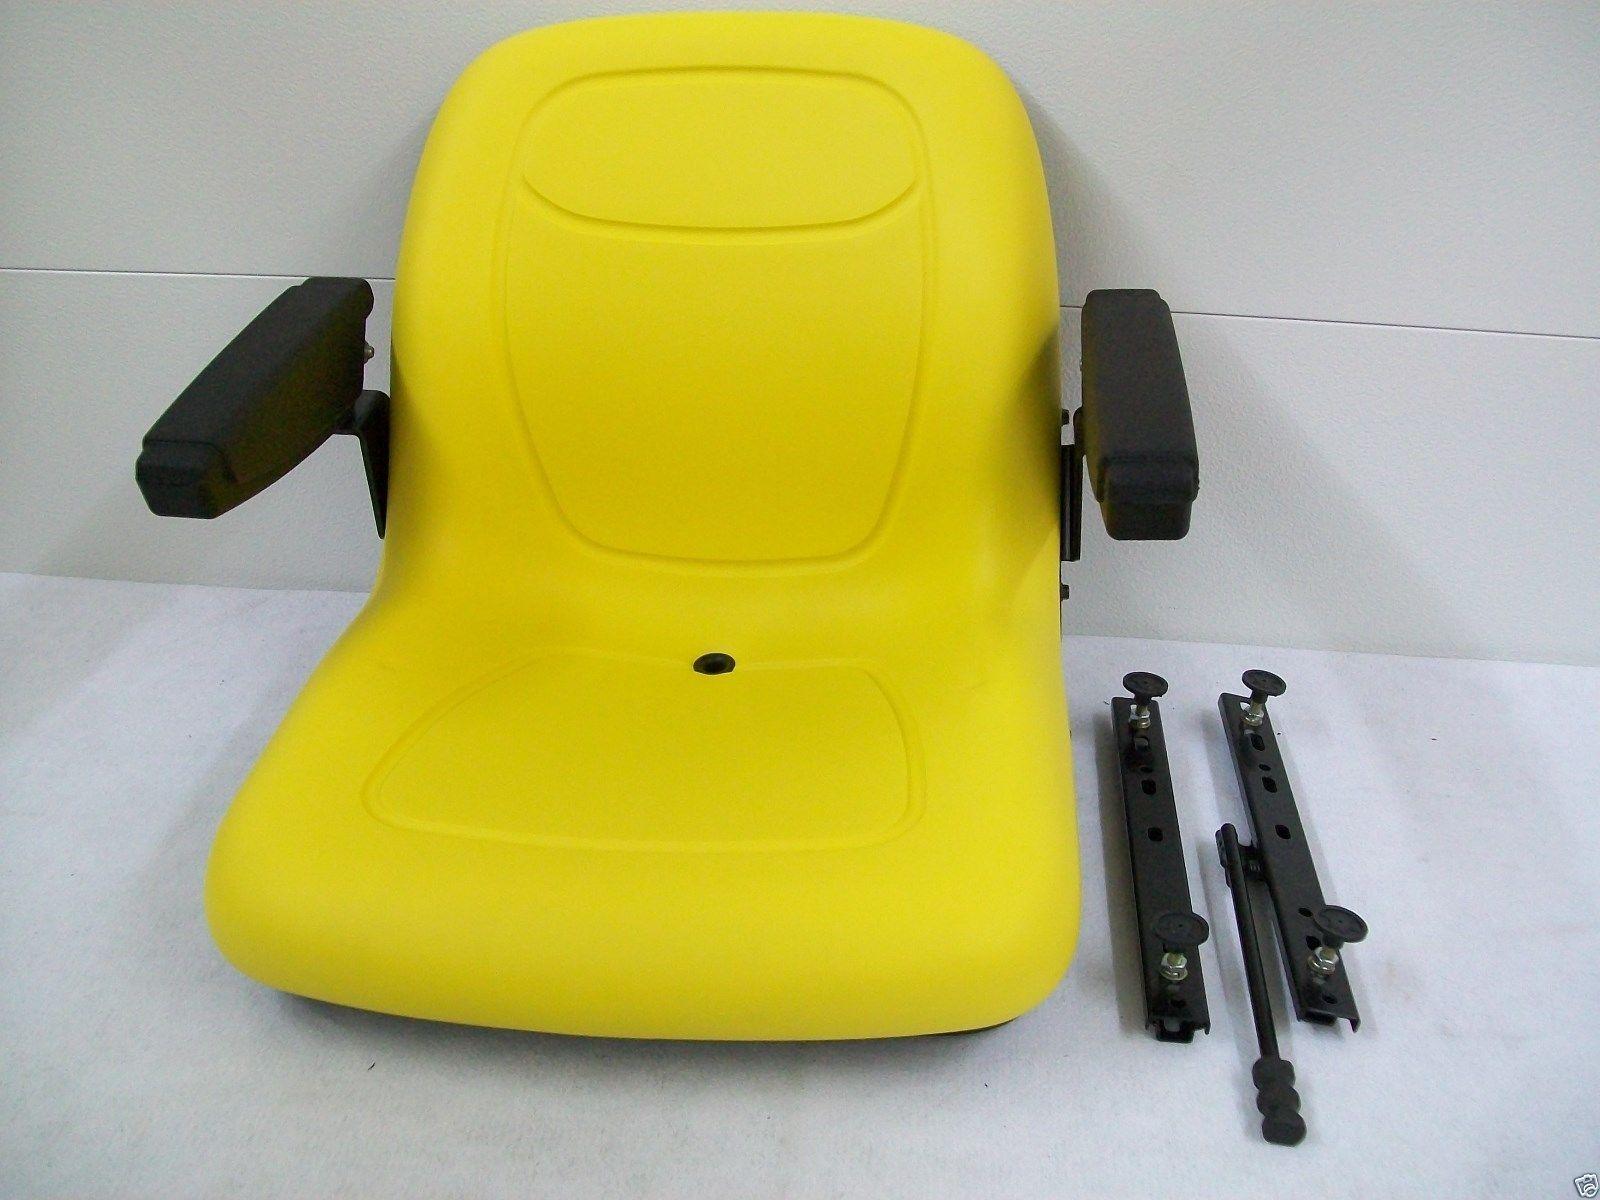 YELLOW SEAT KUBOTA HUSTLER EXMARK TORO BOBCAT BUNTON JOHN